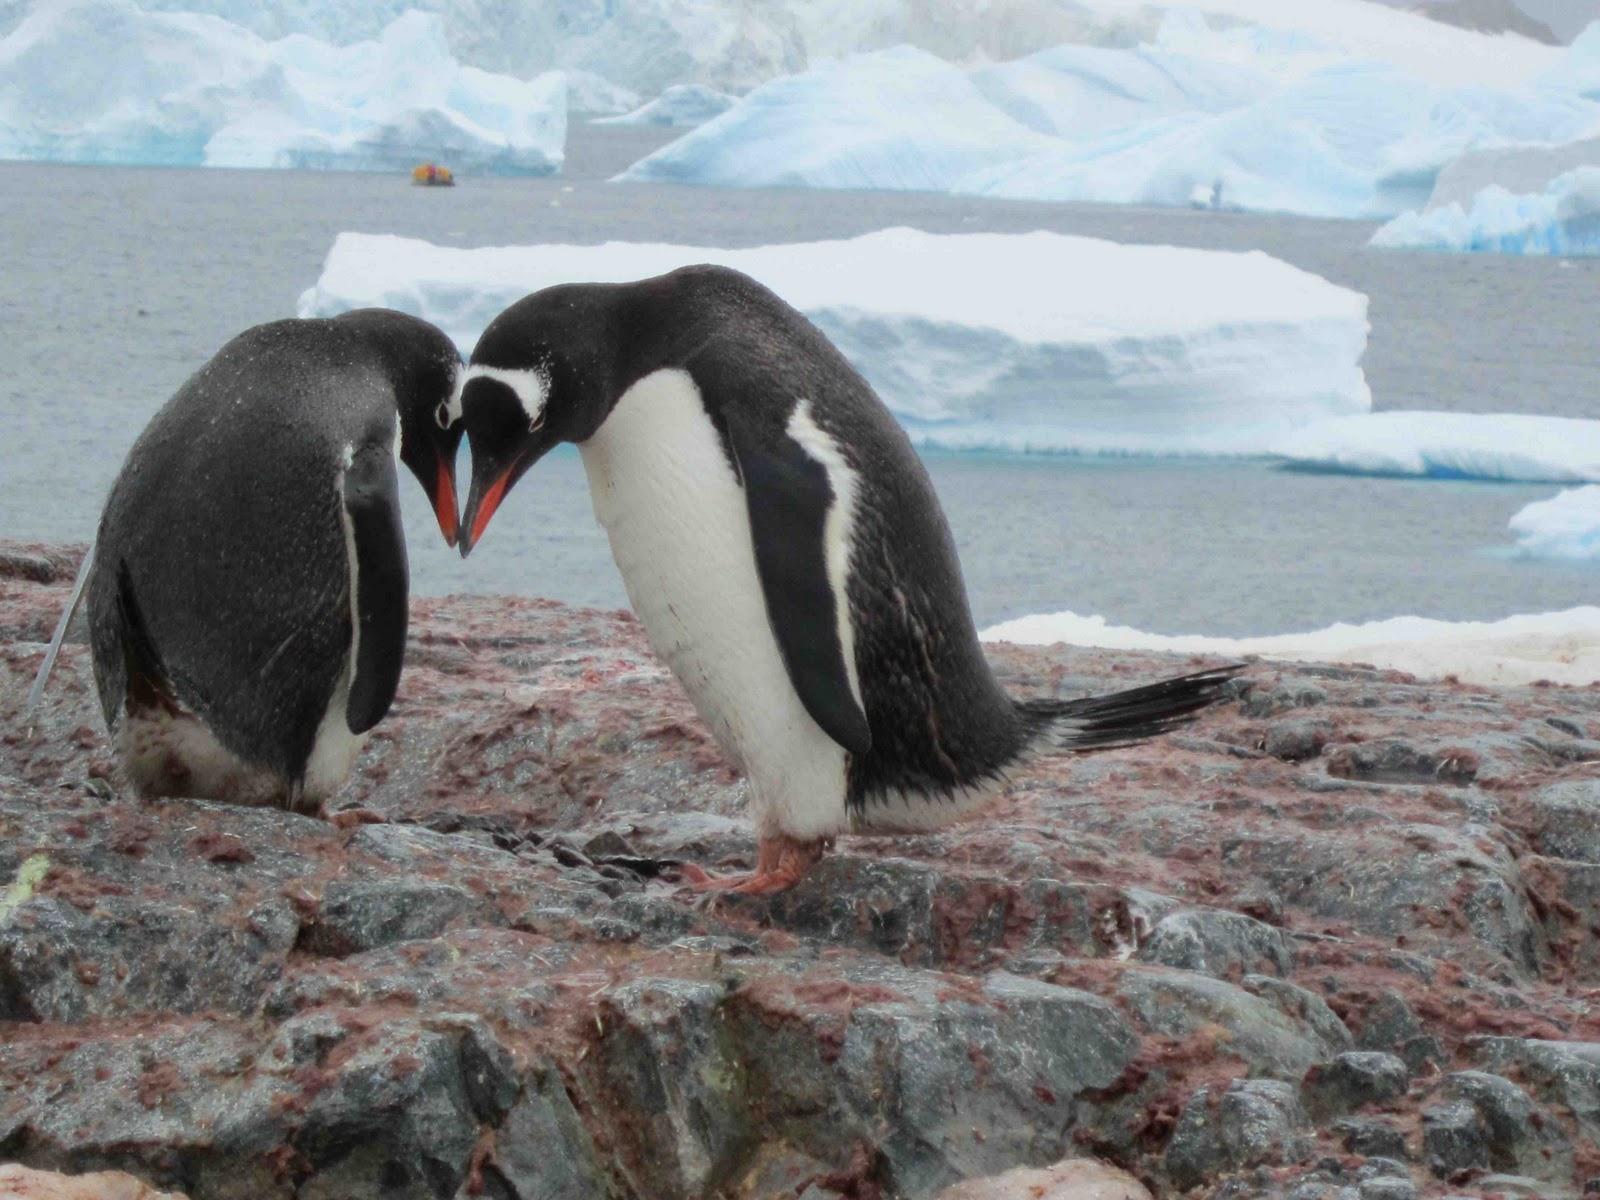 penguin dating Dating is murder a novel a novel a novel by harley jane kozak by harley jane kozak by harley jane kozak by harley jane kozak by harley jane kozak.